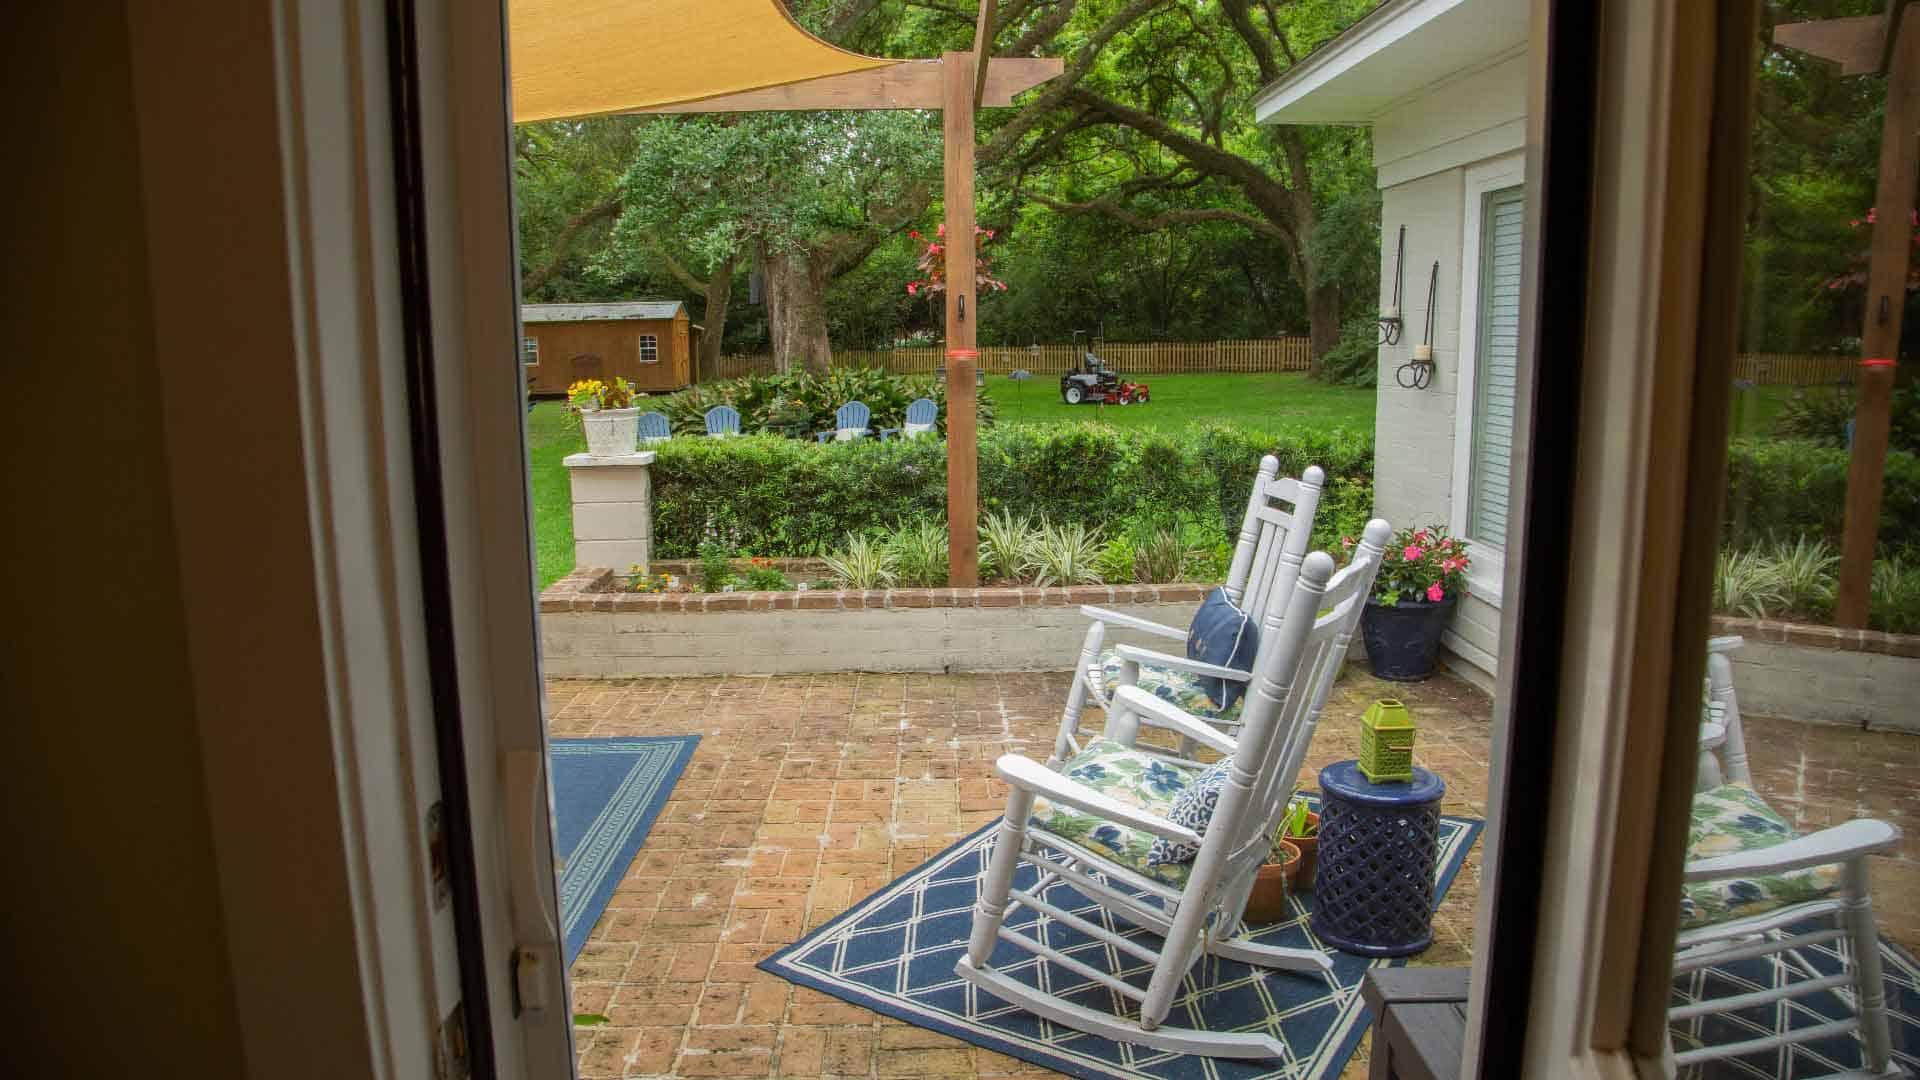 Unobstructed view of a outdoor space through a retractable screen door.